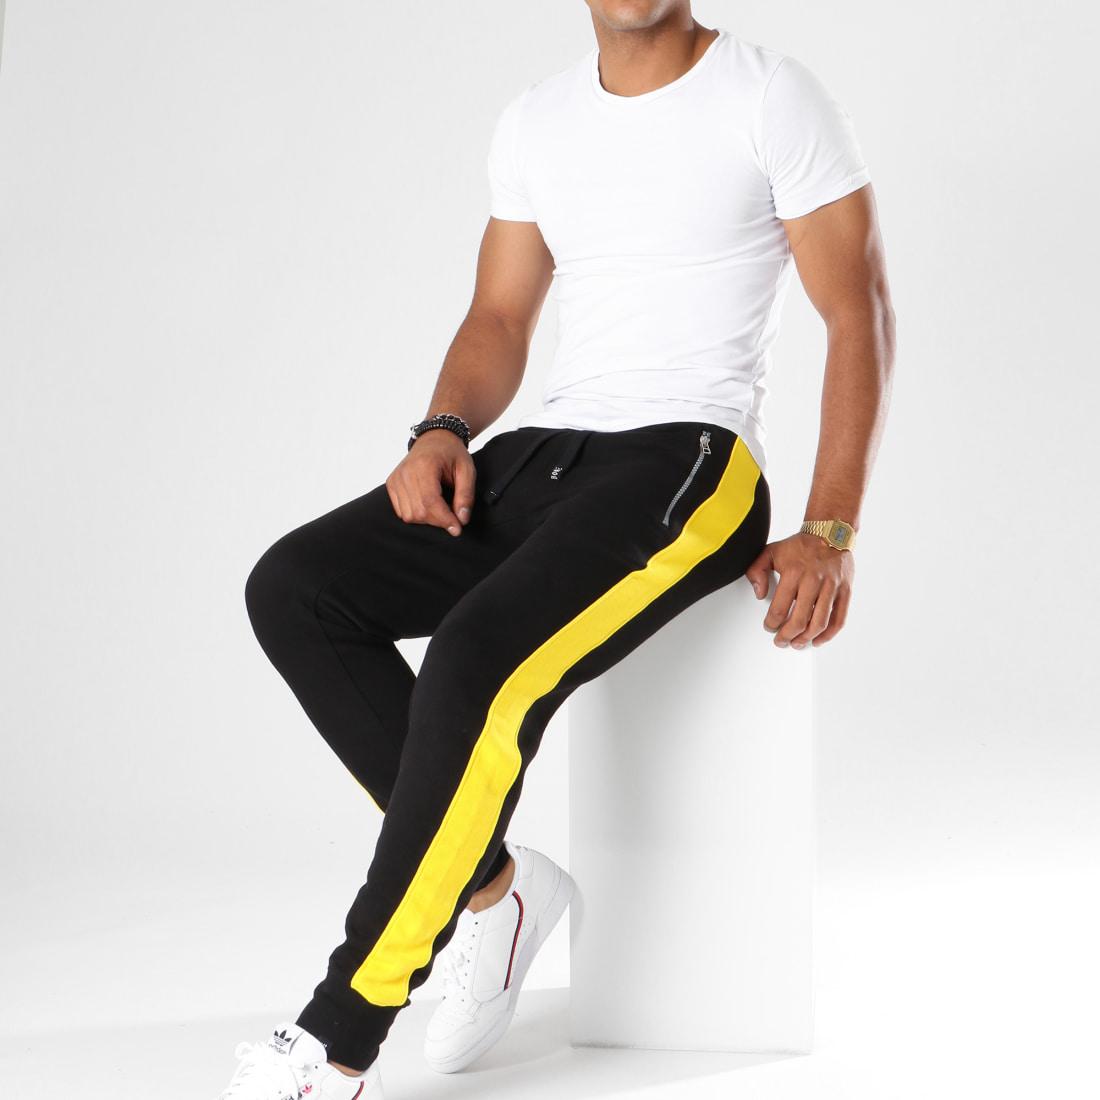 Hechbone Pantalon Jogging Avec Bandes Kin Noir Jaune